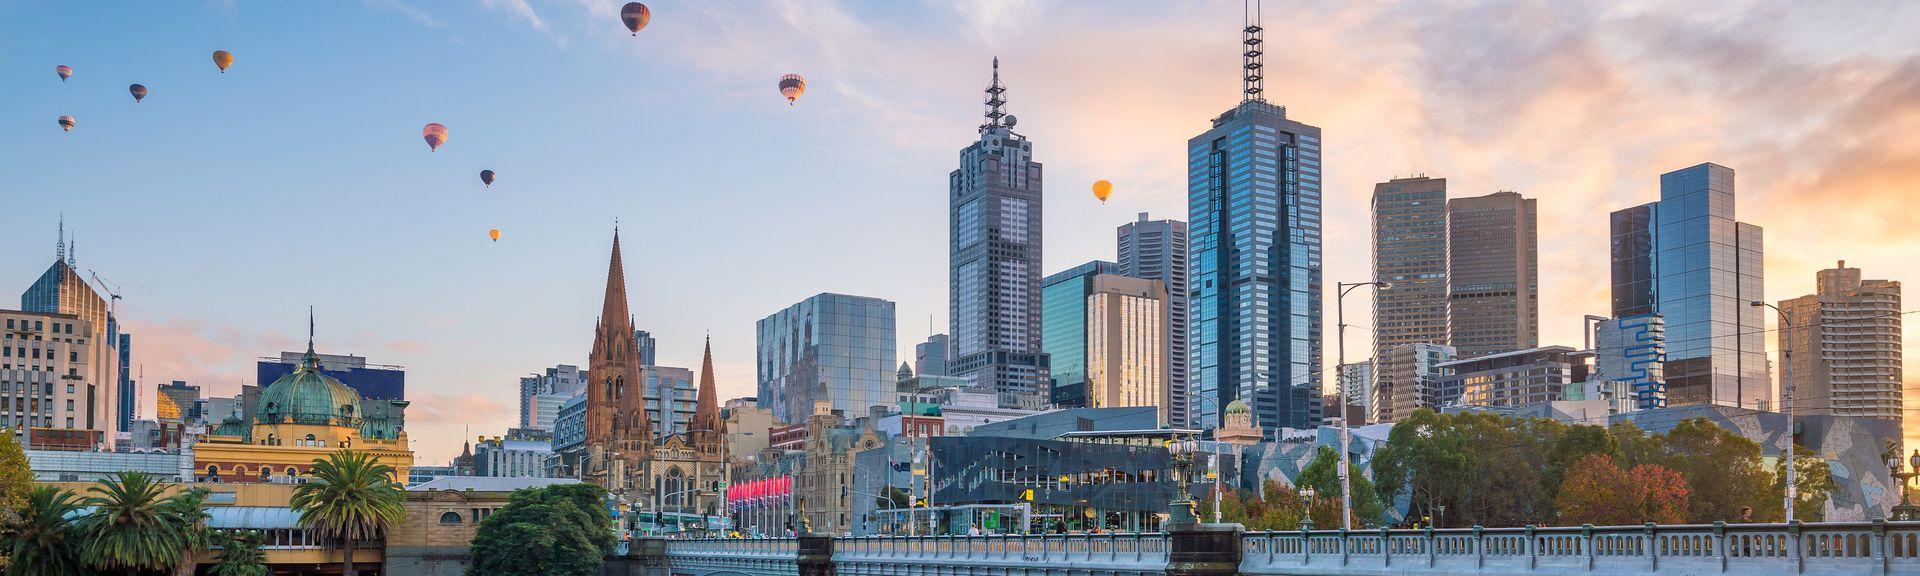 Southbank, Melbourne, Victoria, Australia